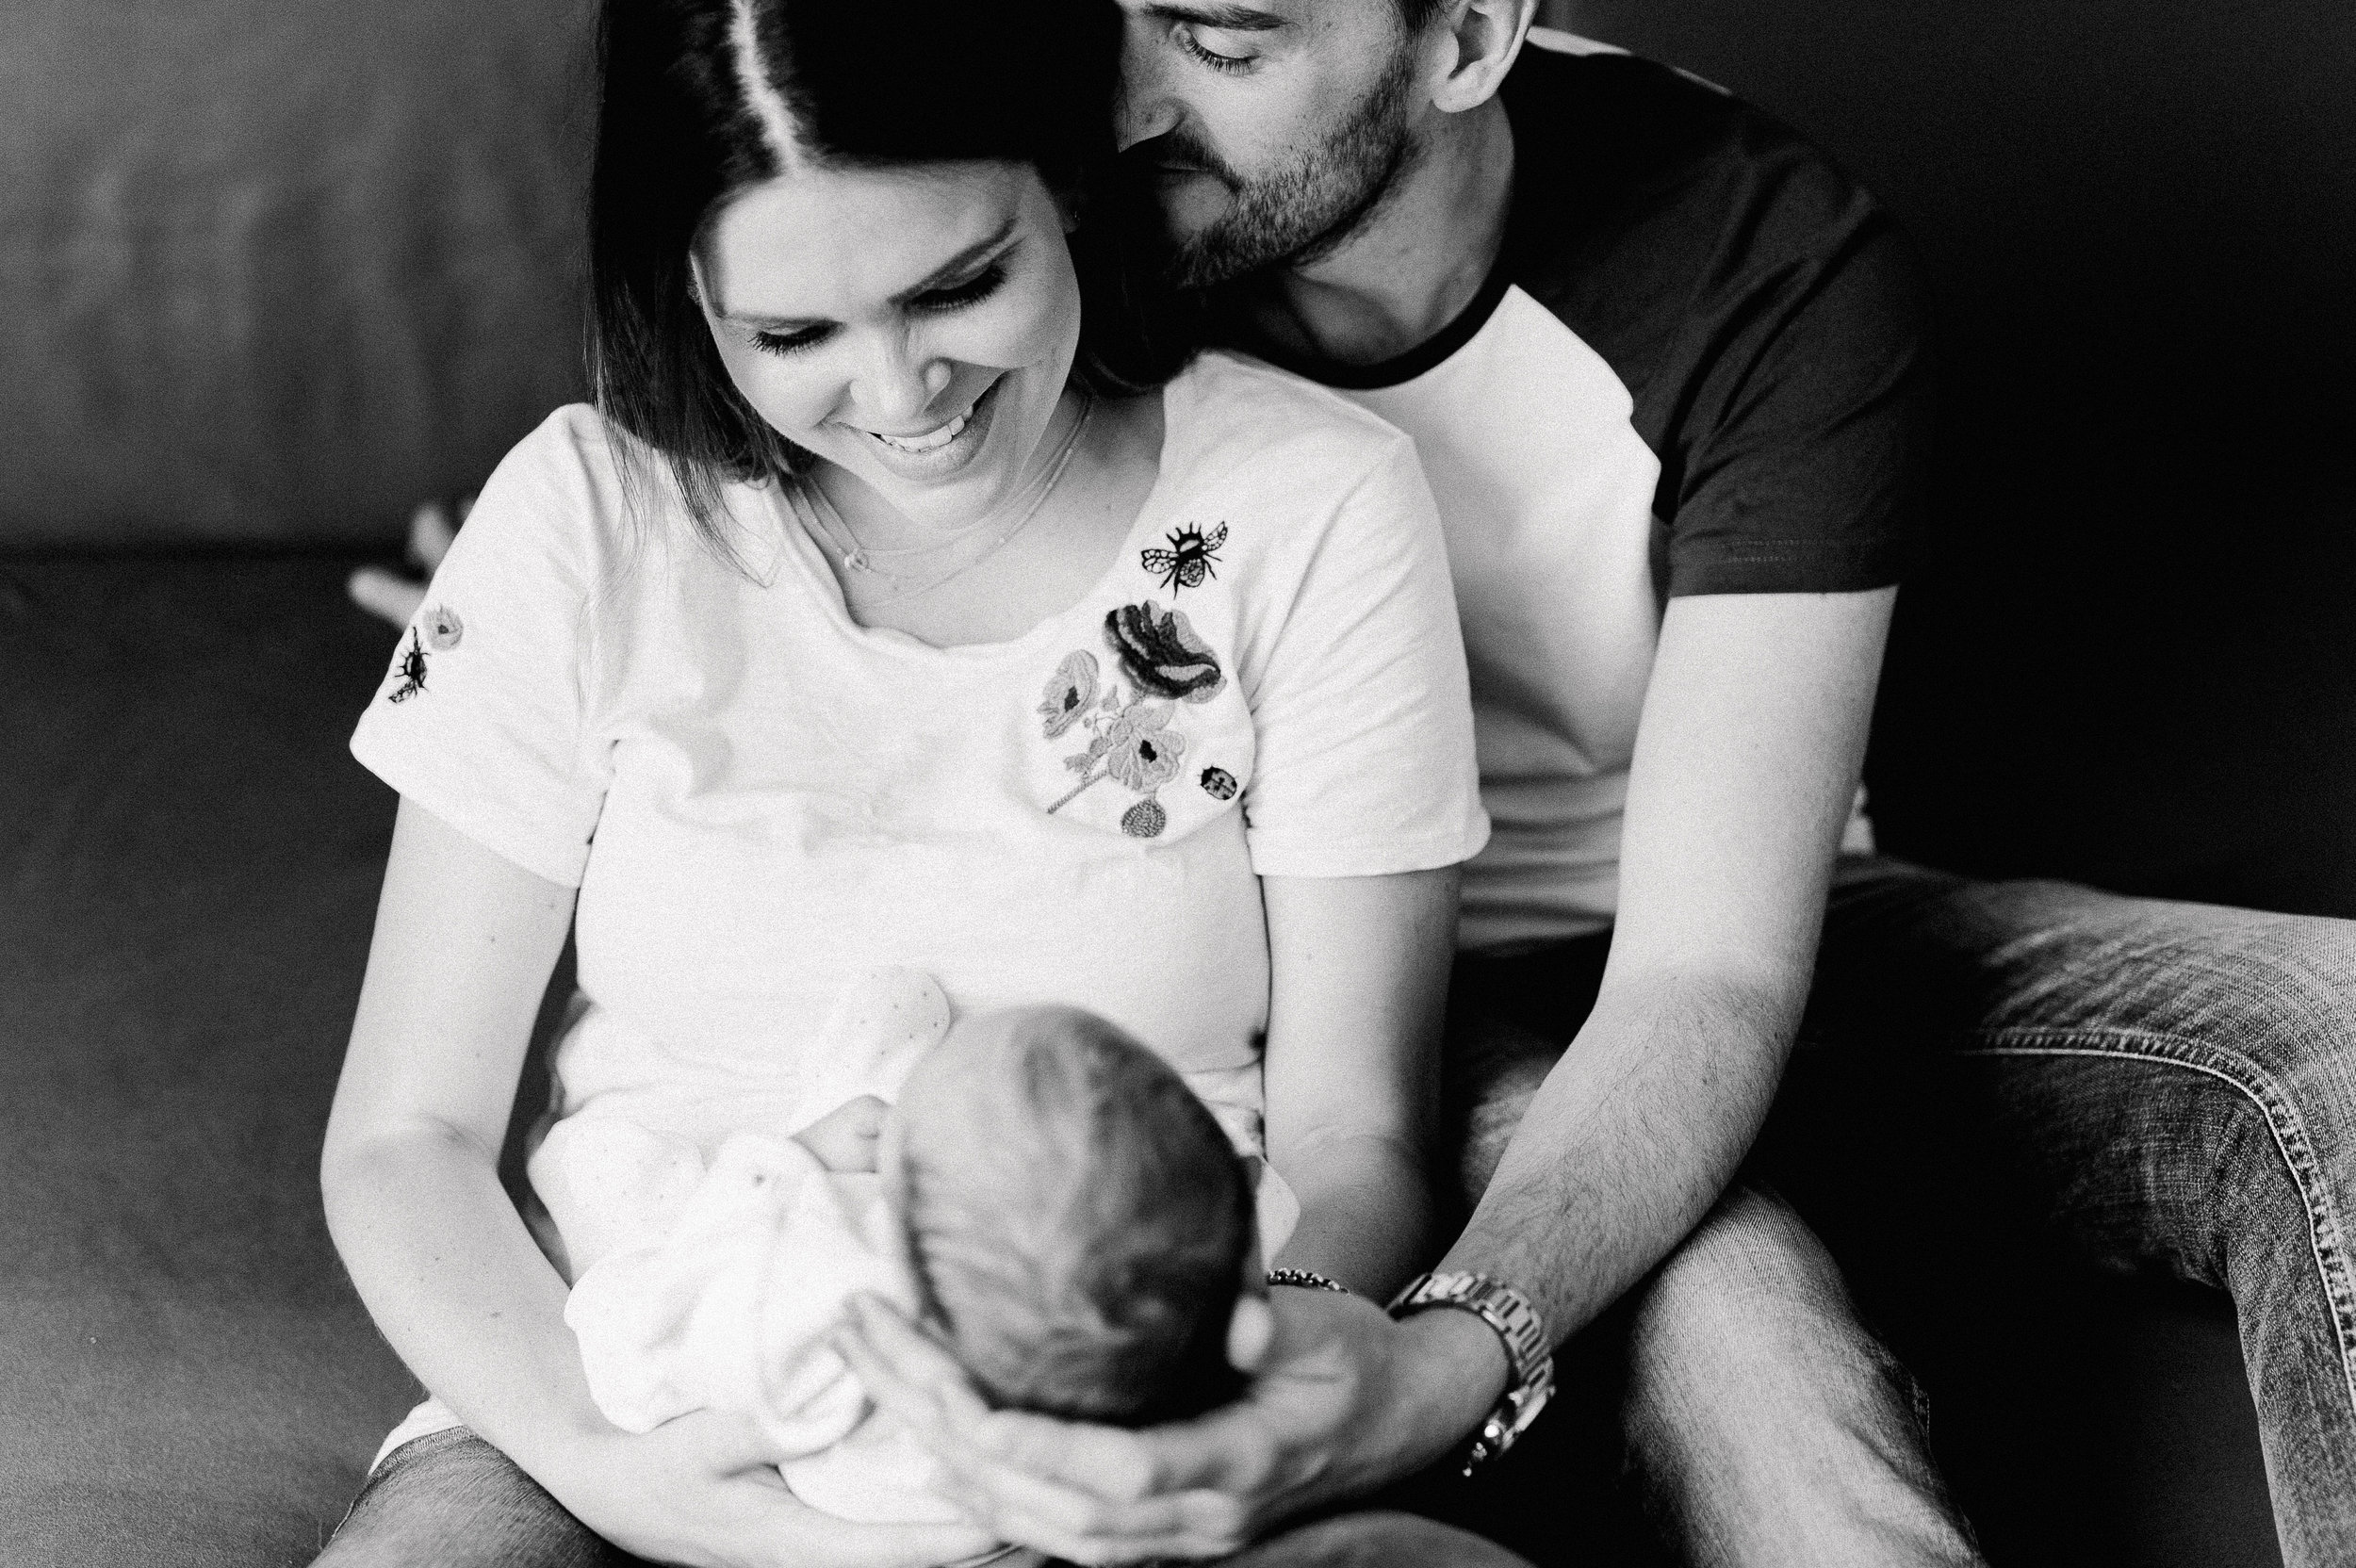 Anna-Hari-Photography-Familienshooting-Neugeborenenshooting-Mannheim-Heidelberg25.jpg